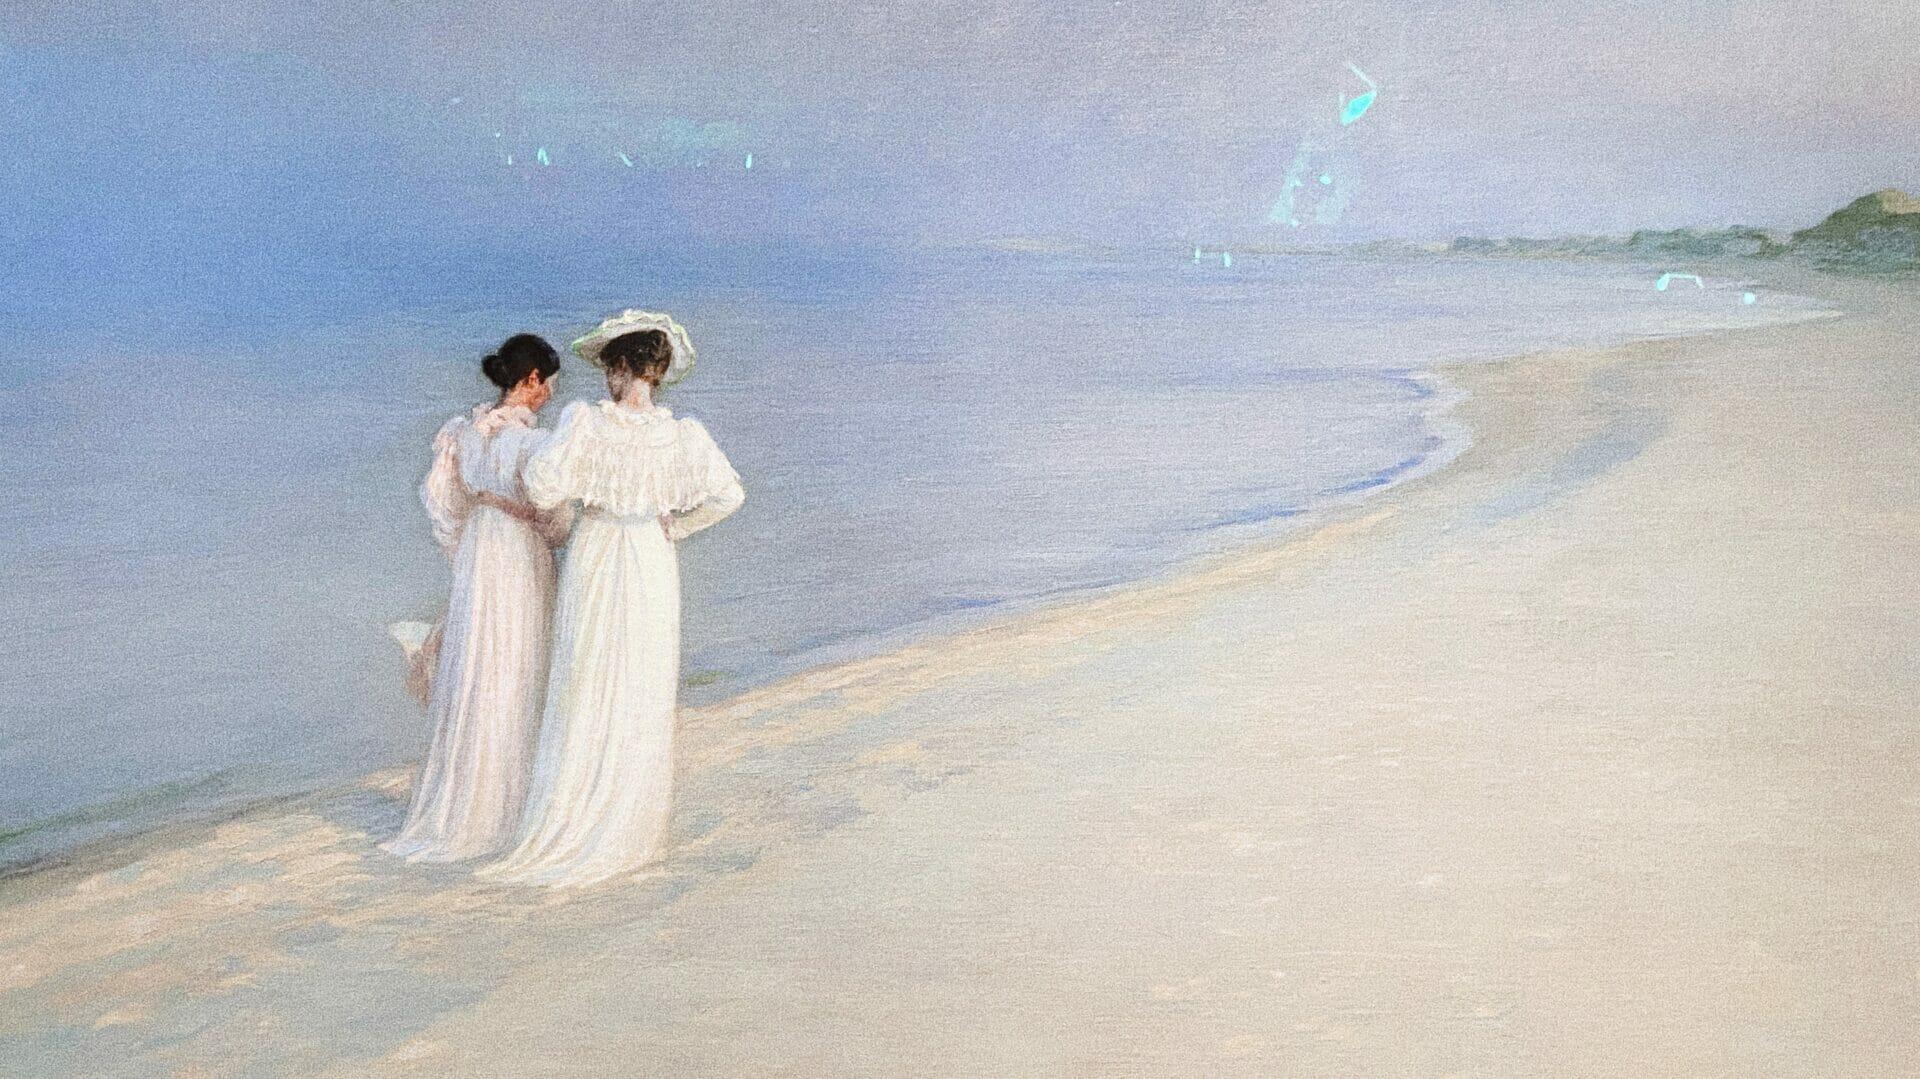 Krøyer, le peintre danois «incrøyable»